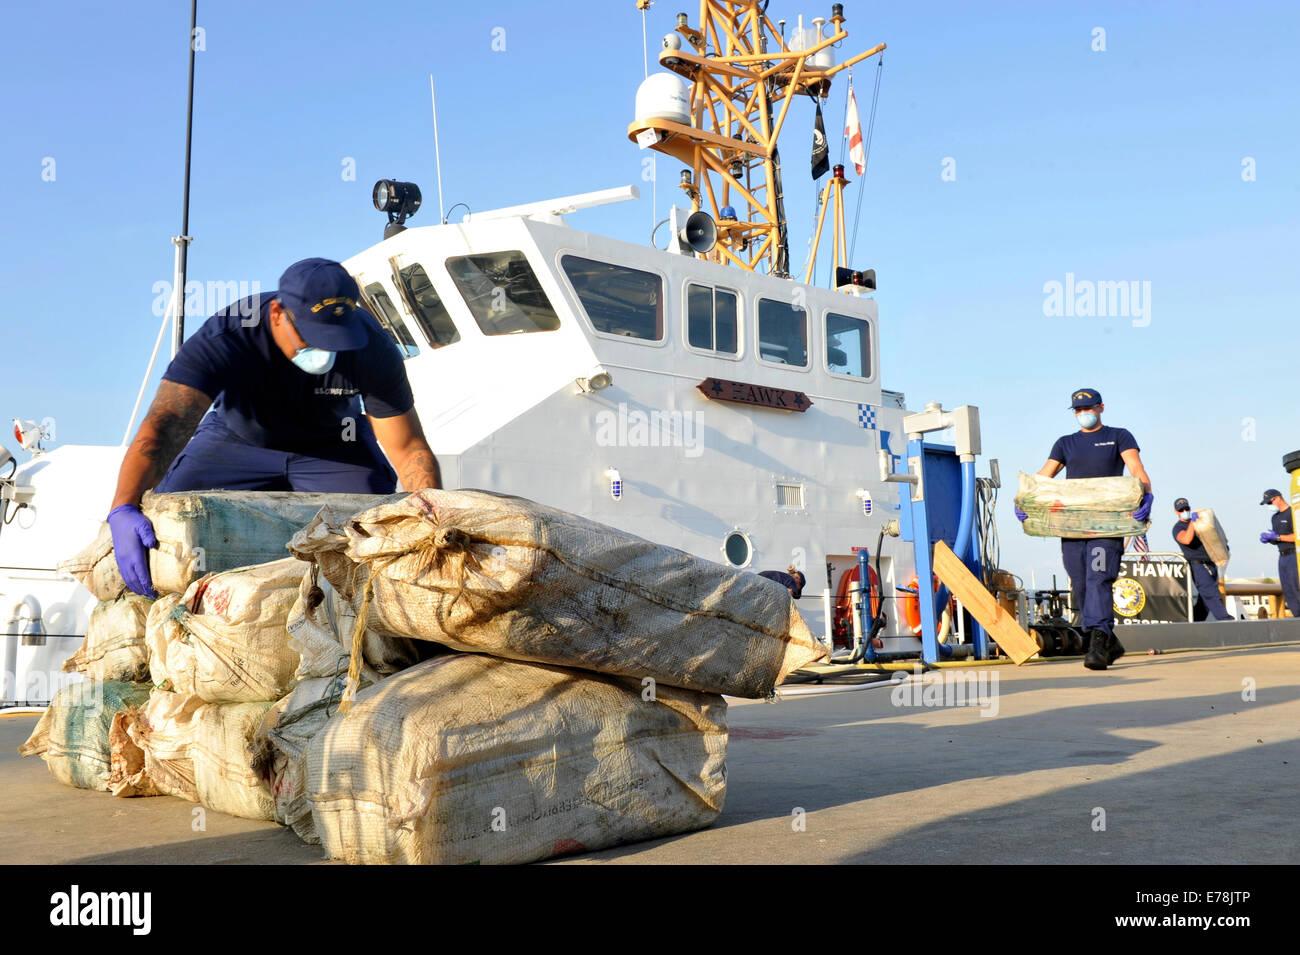 U.S. Coast Guardsmen assigned to the coastal patrol boat USCGC Hawk (WPB 87355) unload 576 kilograms of cocaine, - Stock Image